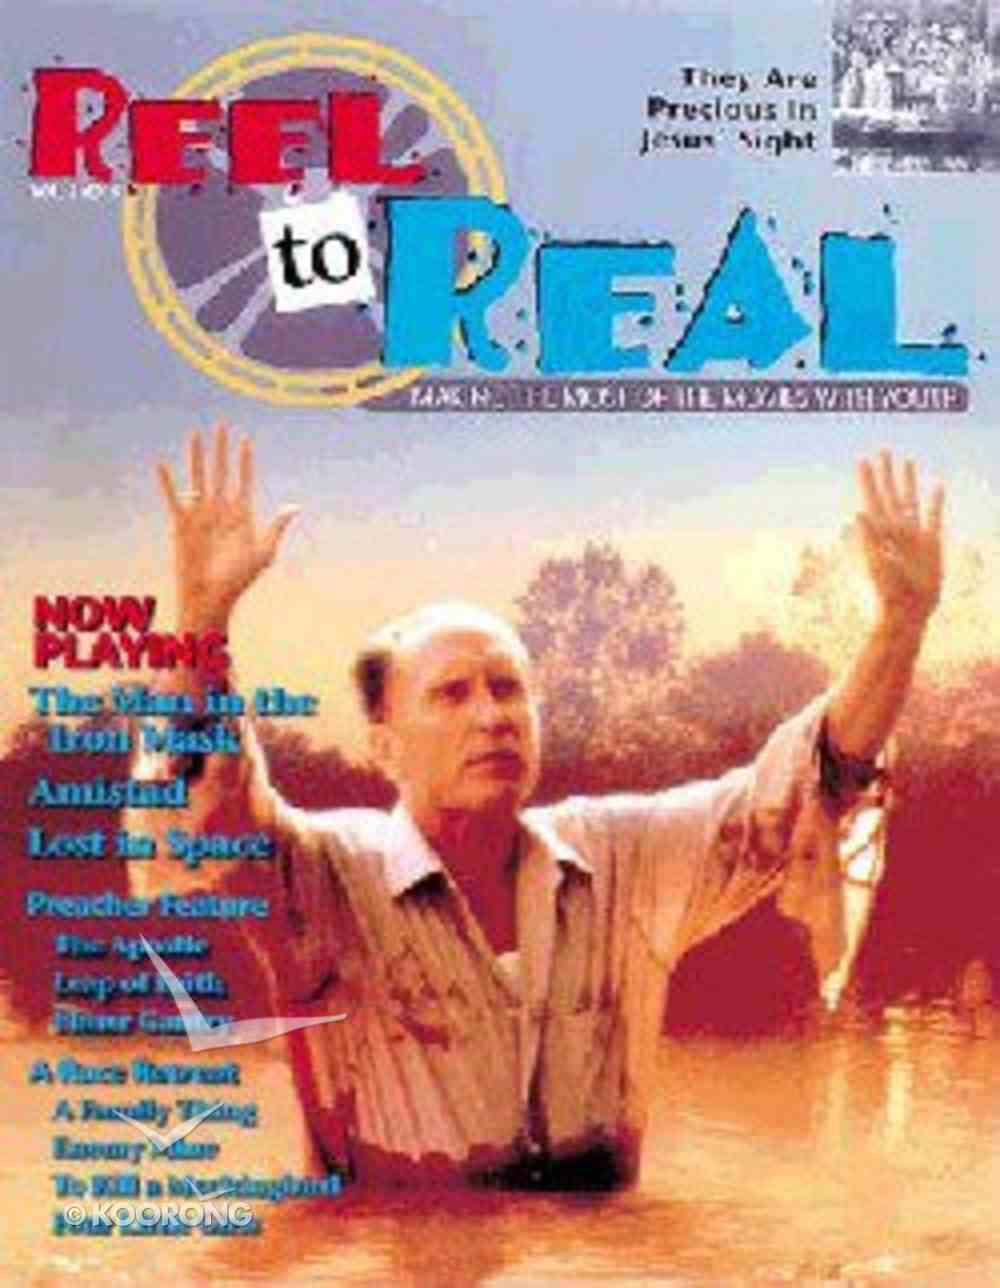 Reel to Real (Vol 2 #3) Paperback